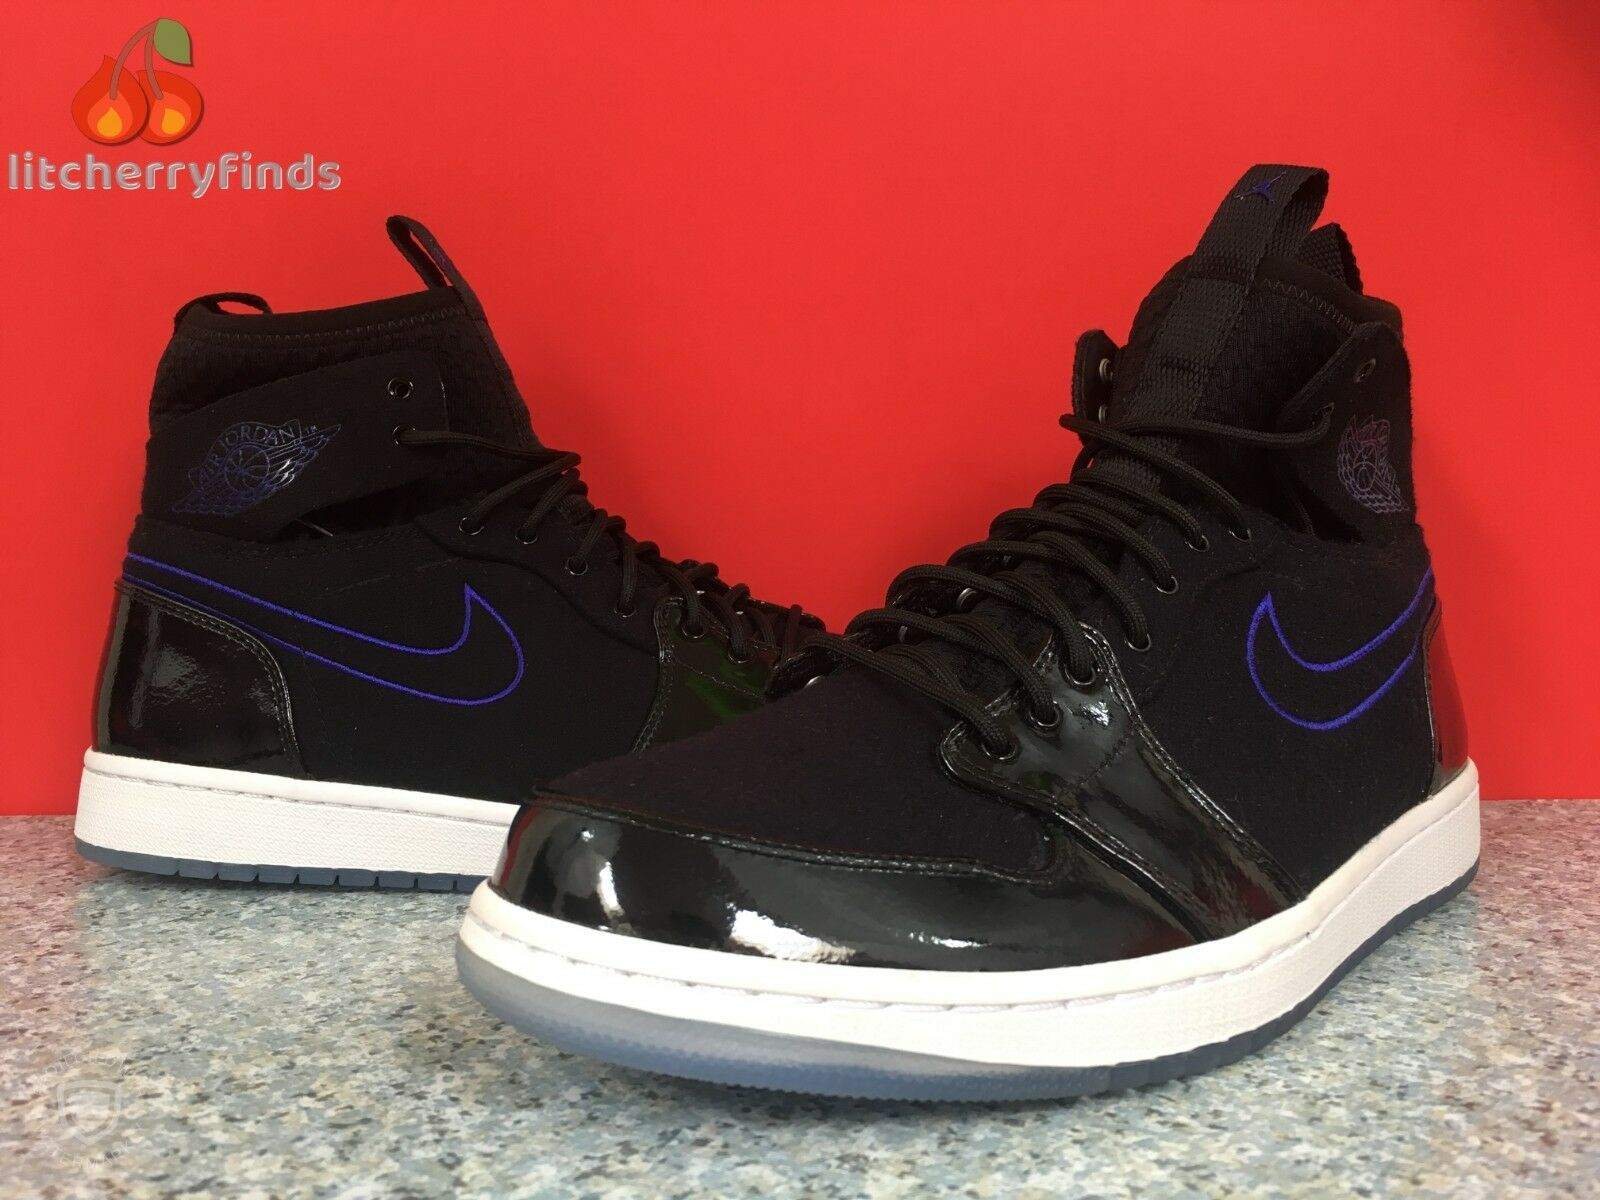 Nike air jordan 1 'ultra high dimensioni 10,5 space jam nero 844700-002 concord